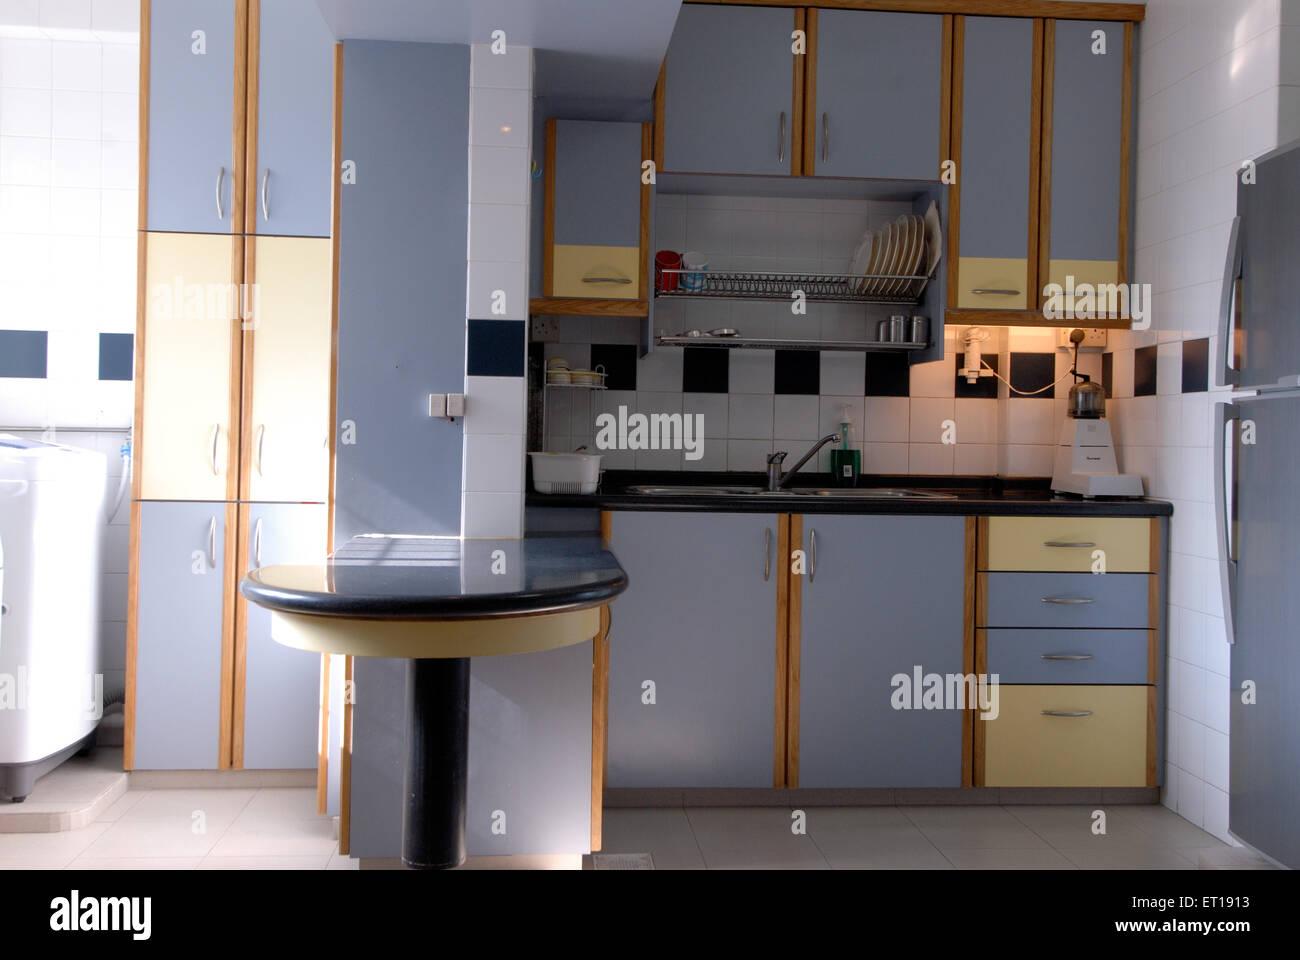 Interior of kitchen - Stock Image